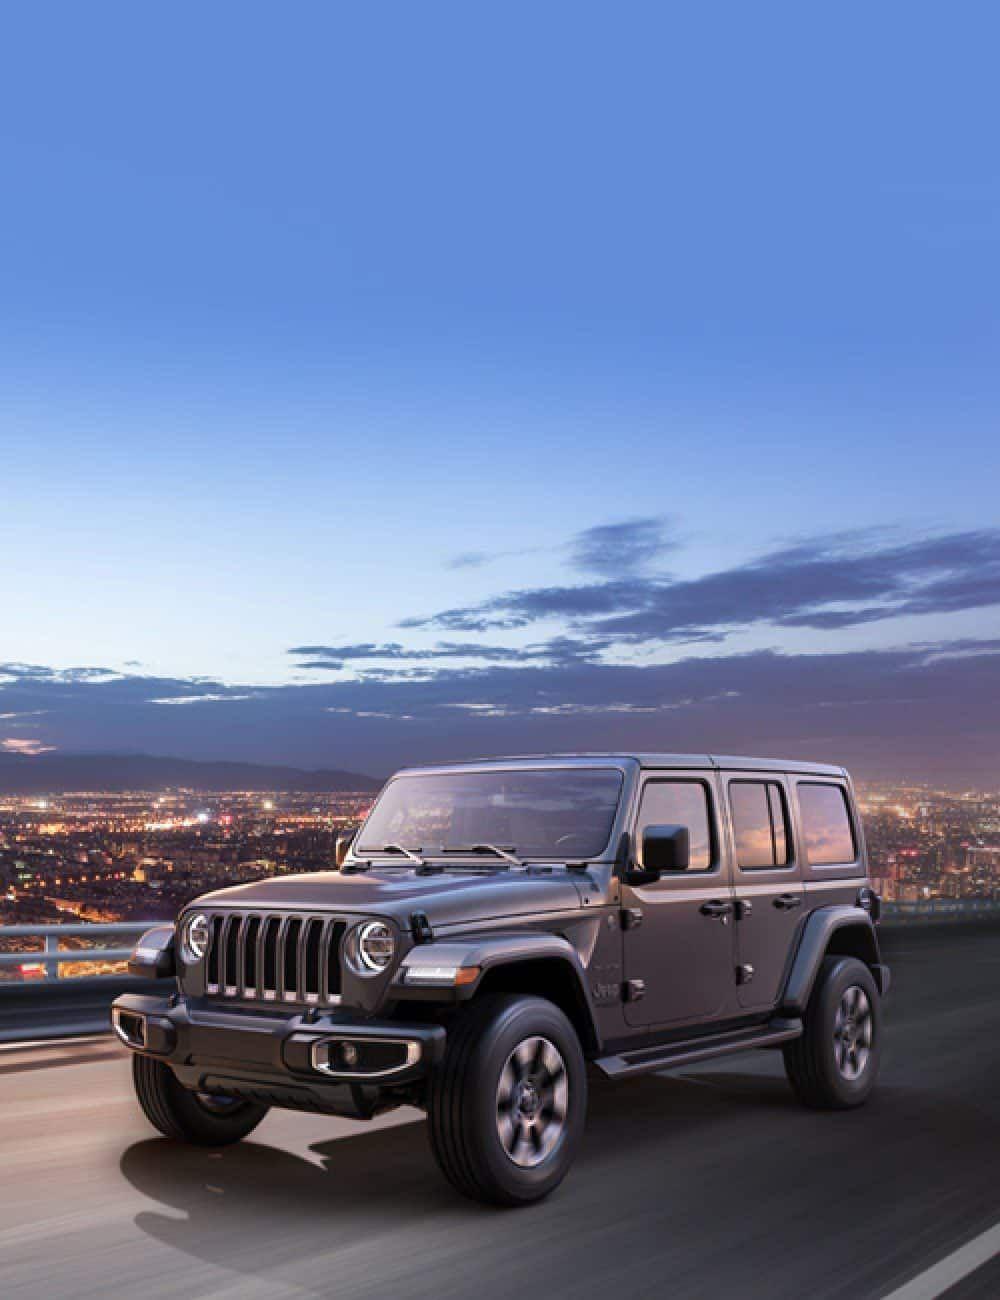 2019 Jeep Wrangler Overview Hero 1 Sahara City Jeep Nuevas